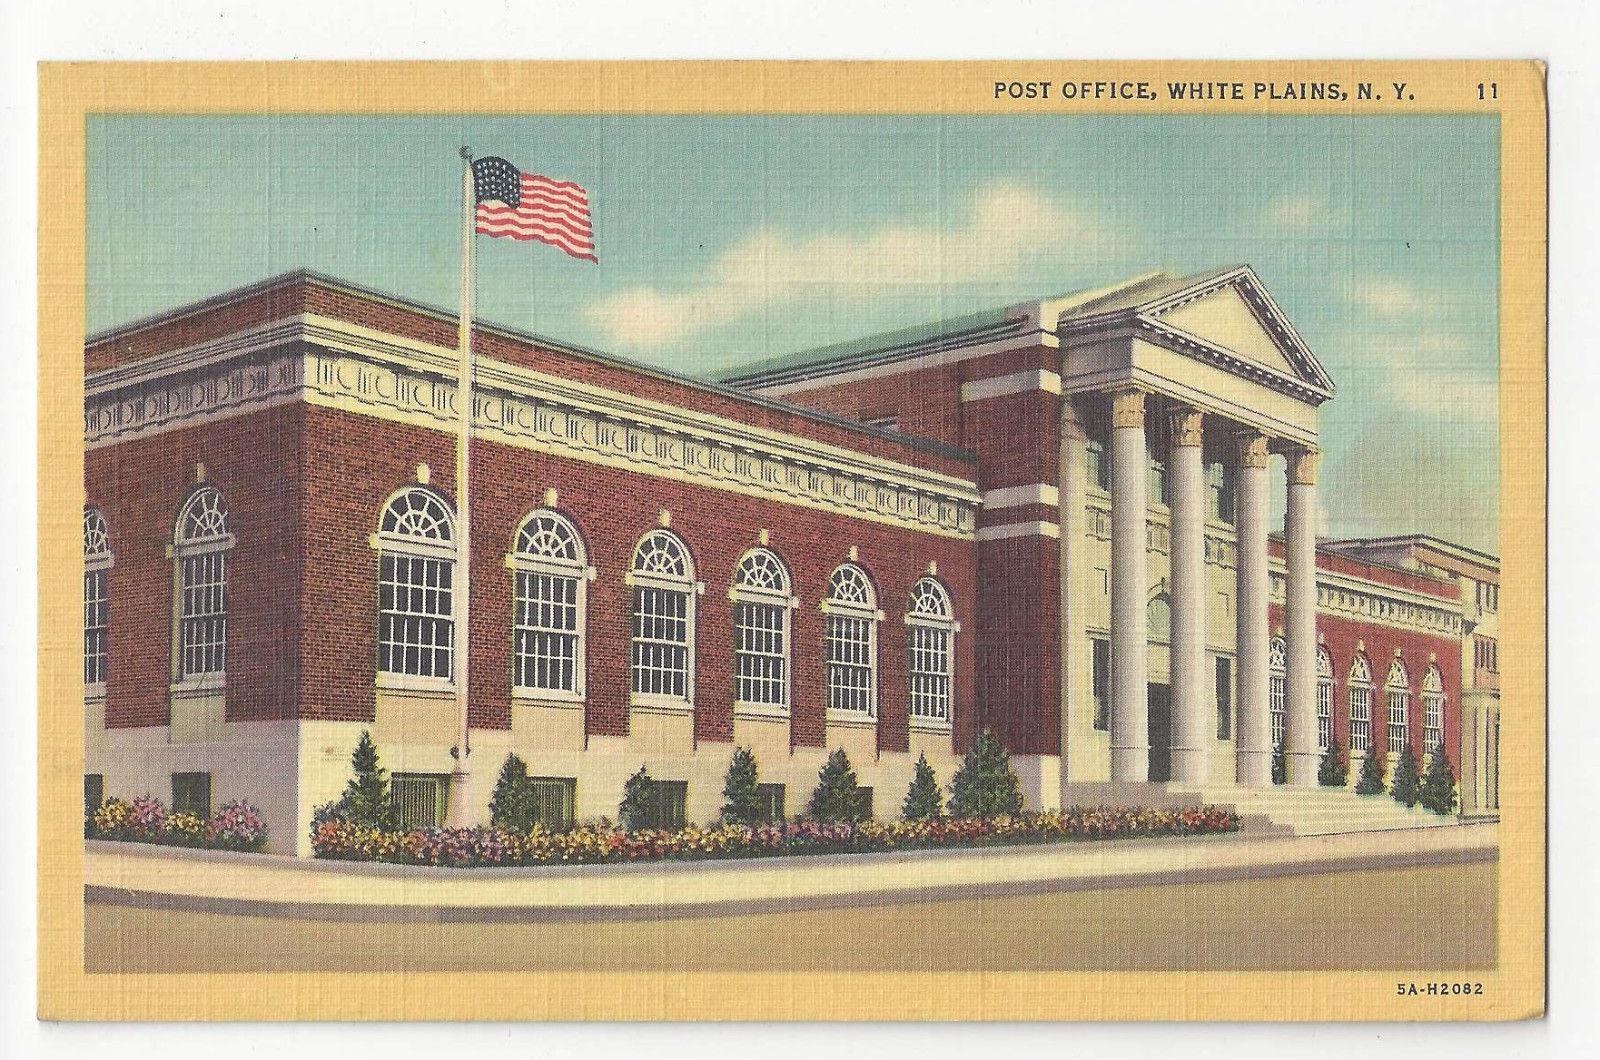 NY White Plains New York Post Office Vintage 1935 Linen Postcard